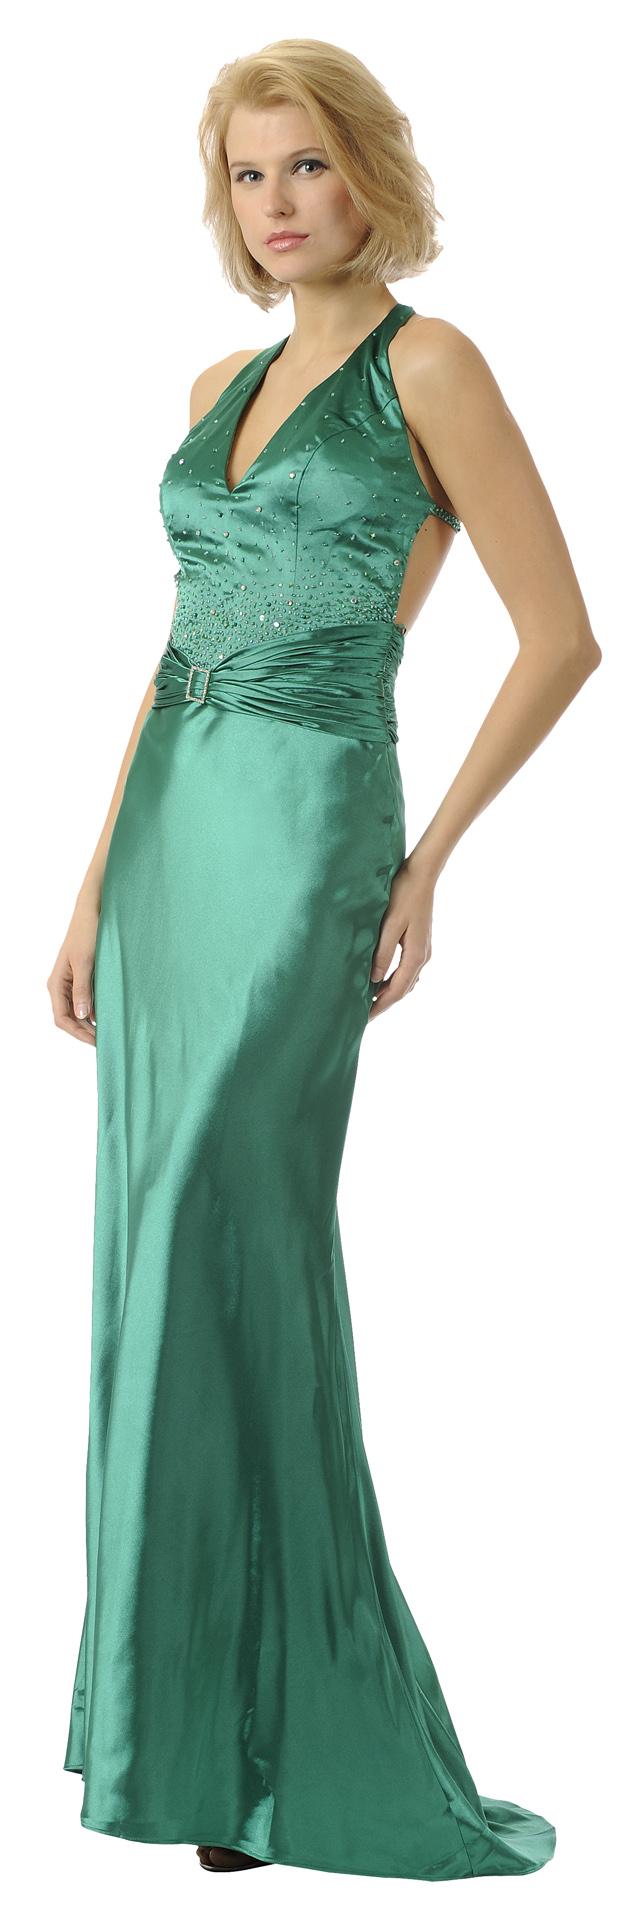 Emerald Green Prom Dress Halter Long Satin Formal Gown $149.99 ...